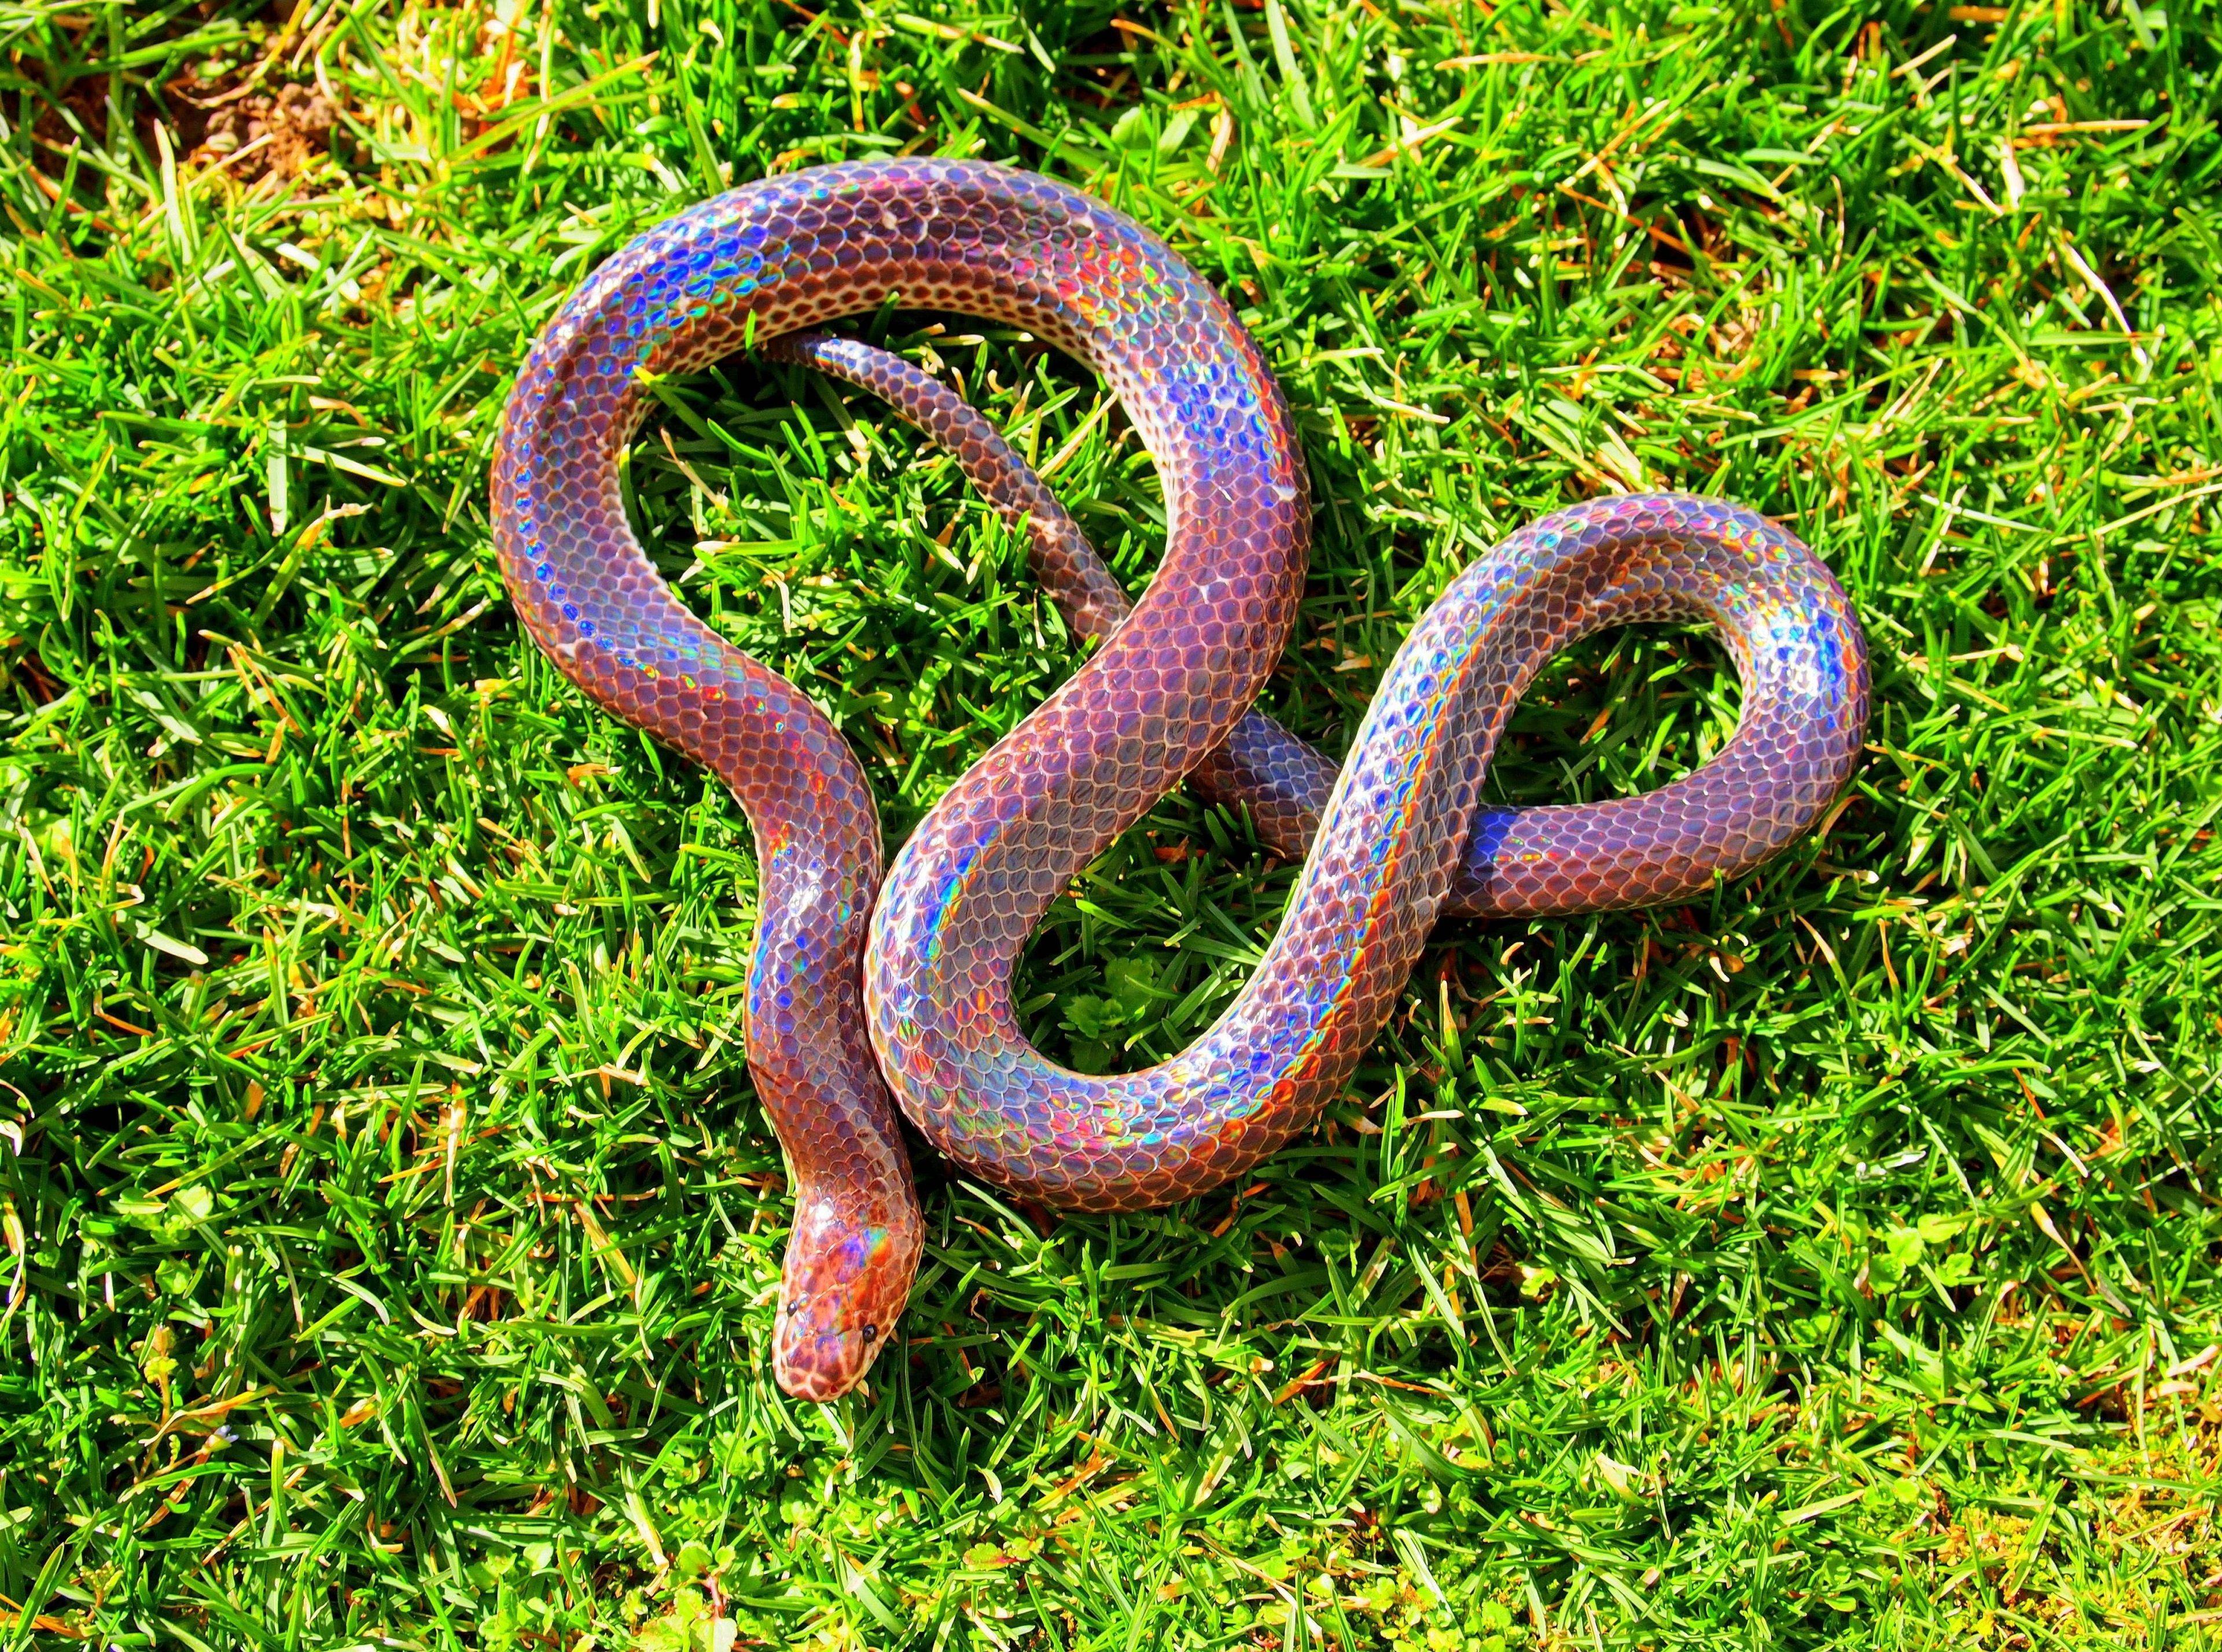 3840x2855 sunbeam snake 4k wallpaper download hd Pretty